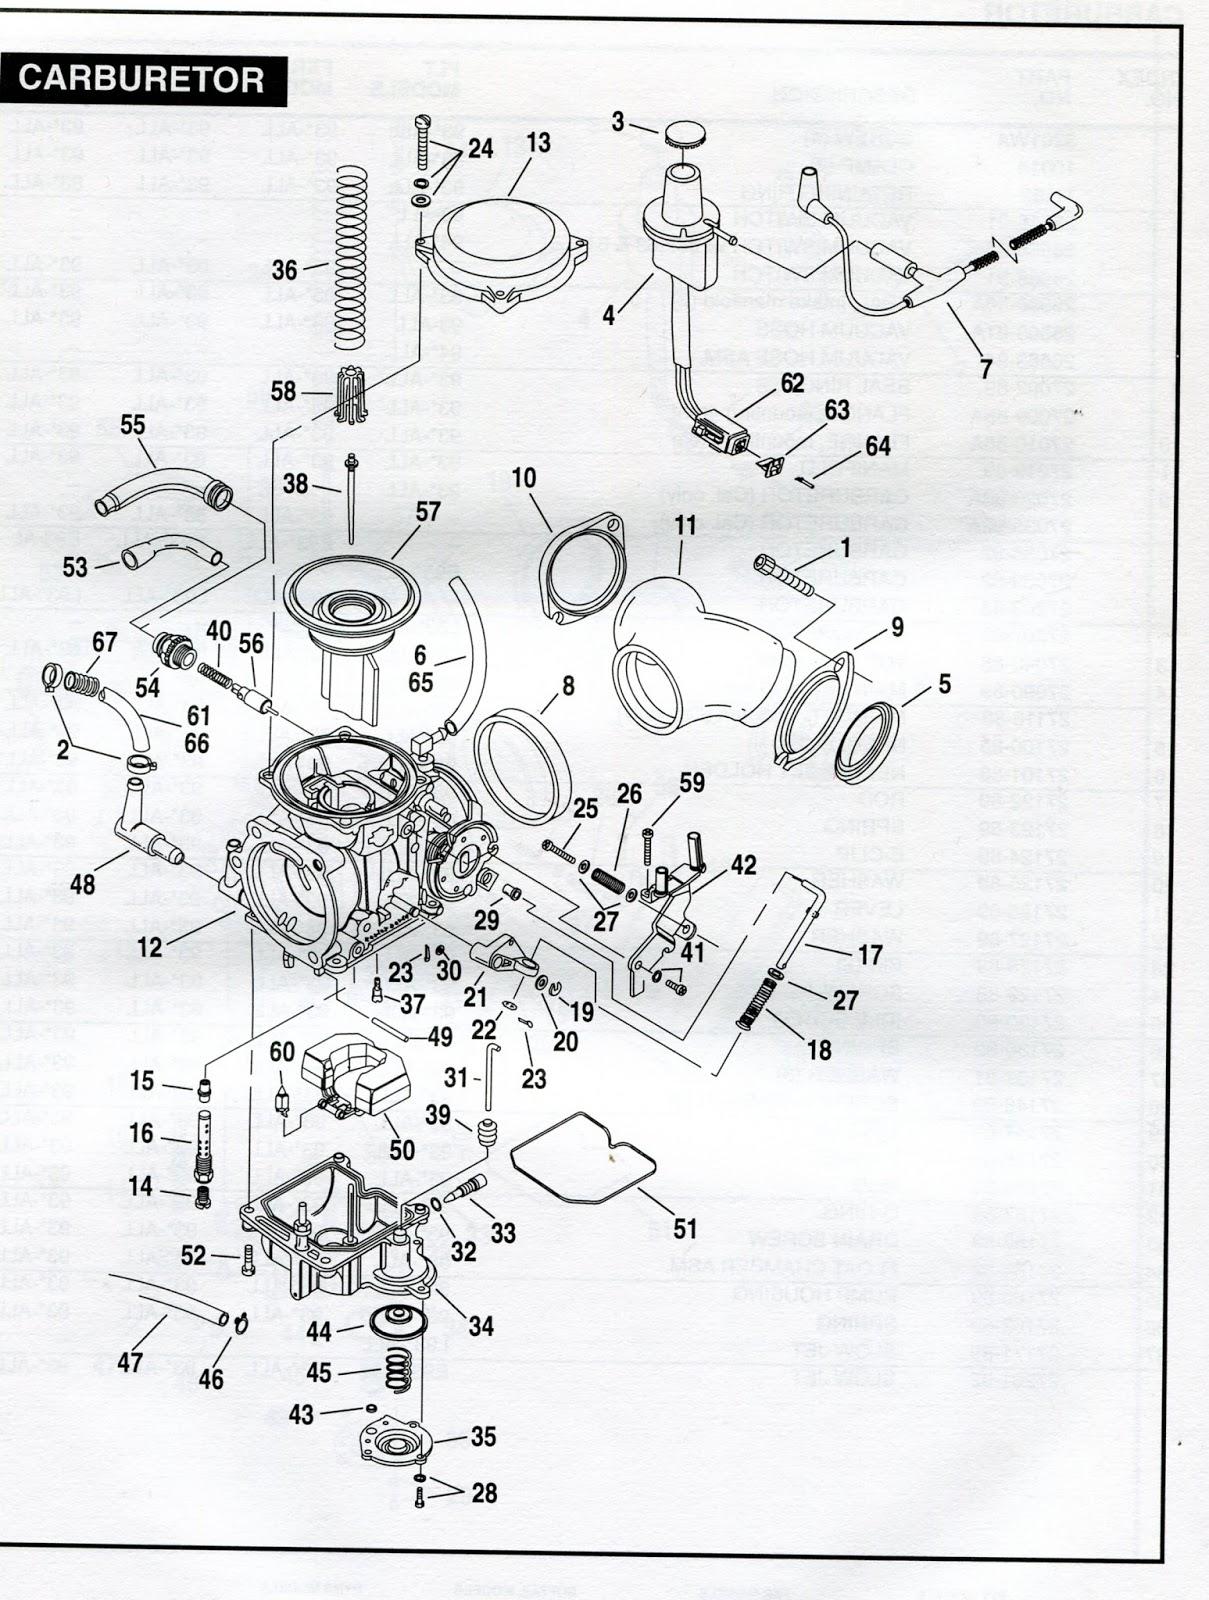 Harley Davidson Fuel Tank Diagram Best Electrical Circuit Wiring For 1947 94 Carburetor Online Rh 5 7 3 Aquarium Ag Goyatz De New Gas Tanks Sportster